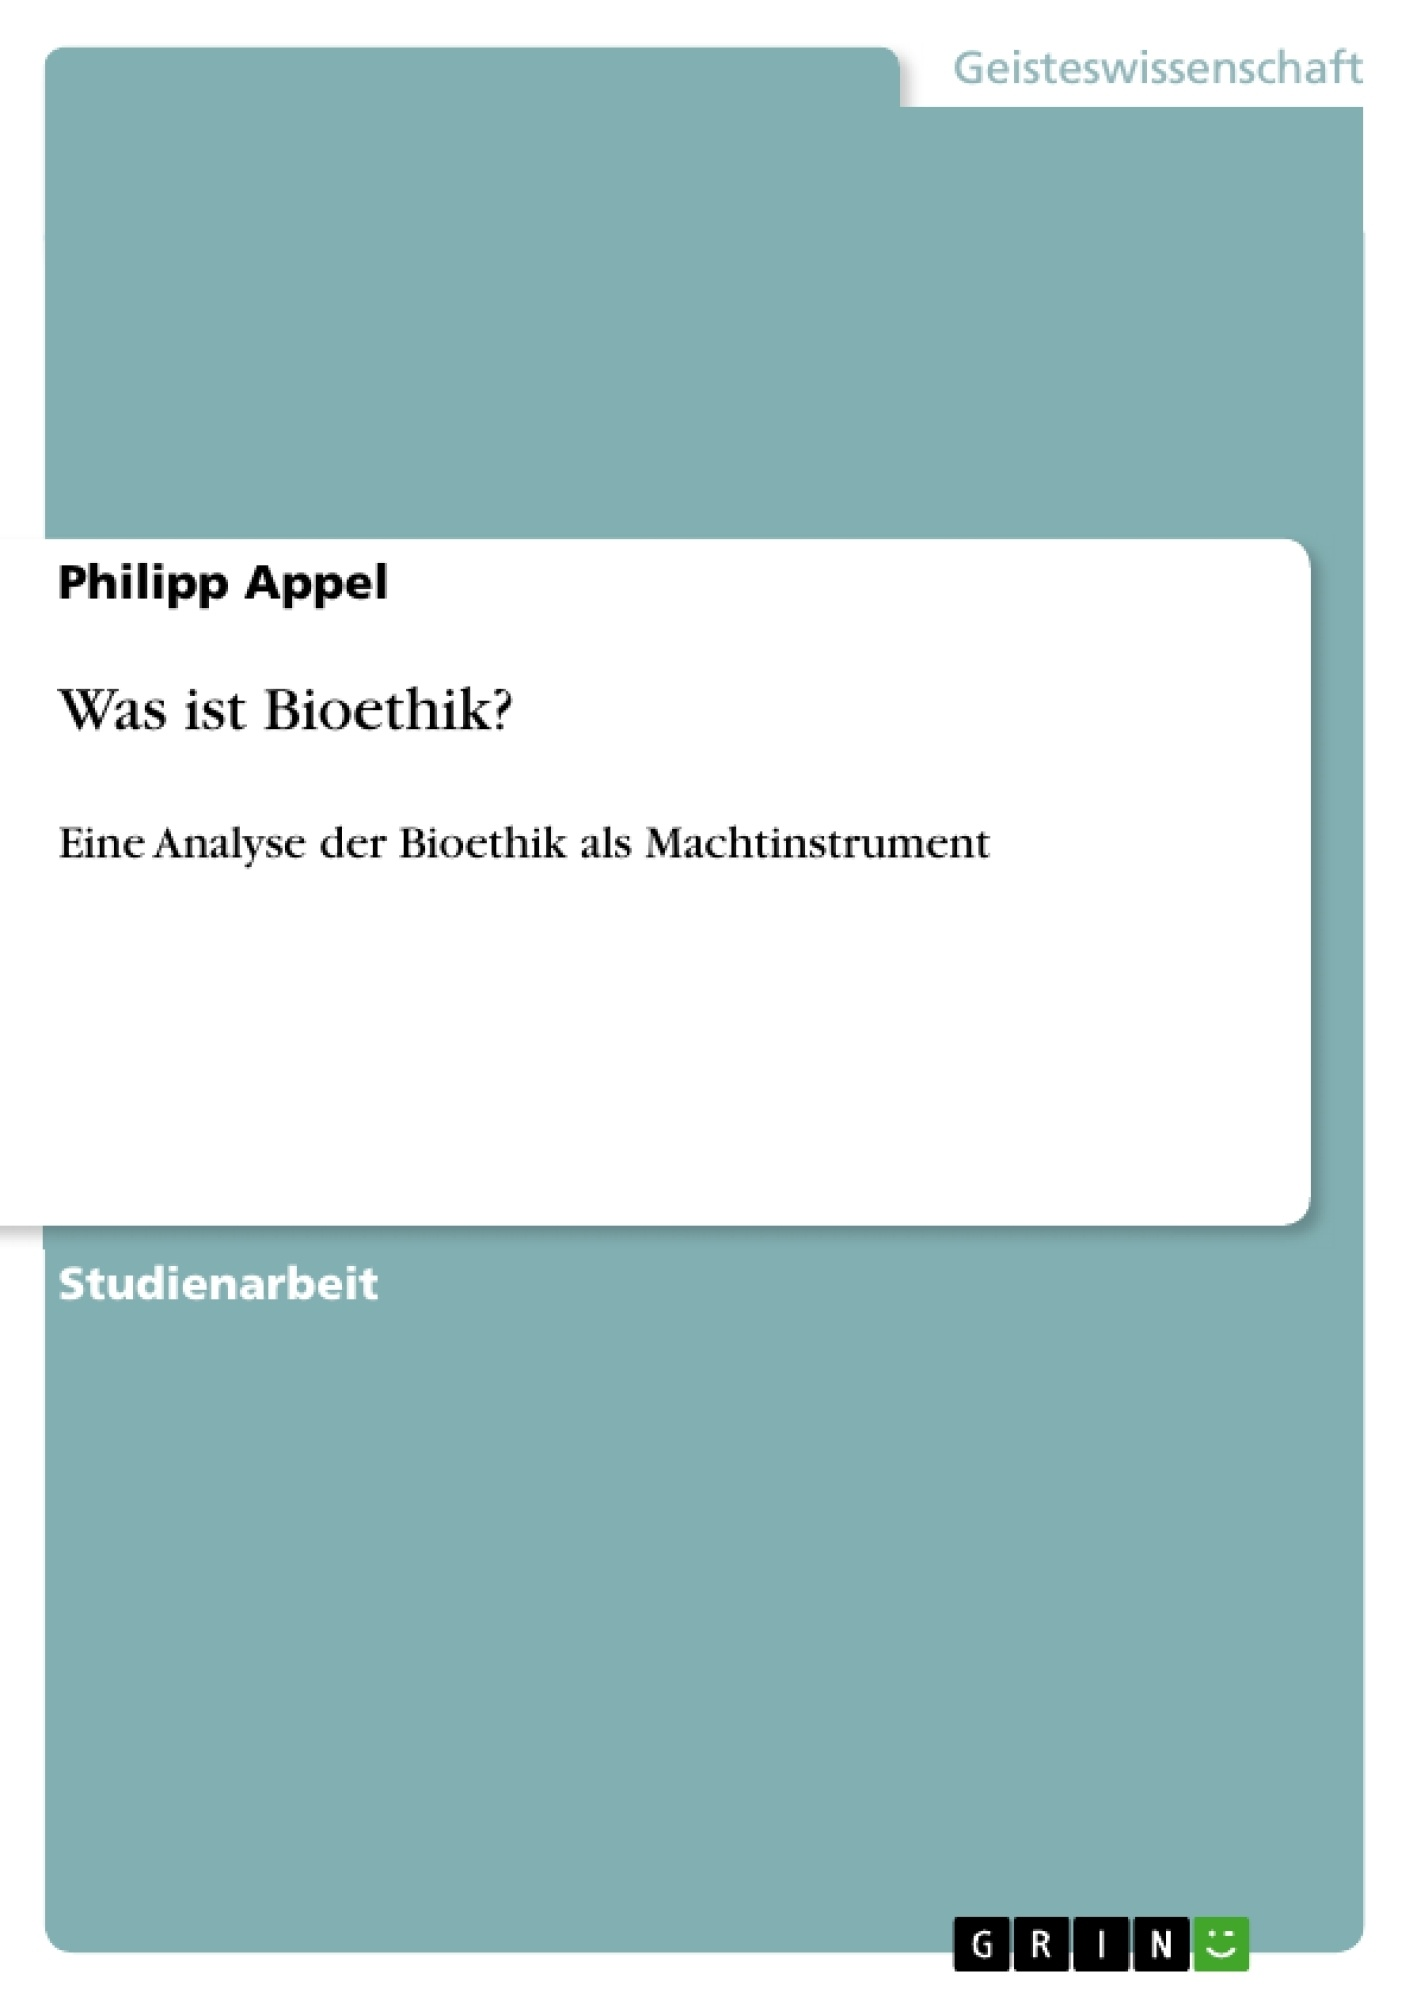 Titel: Was ist Bioethik?